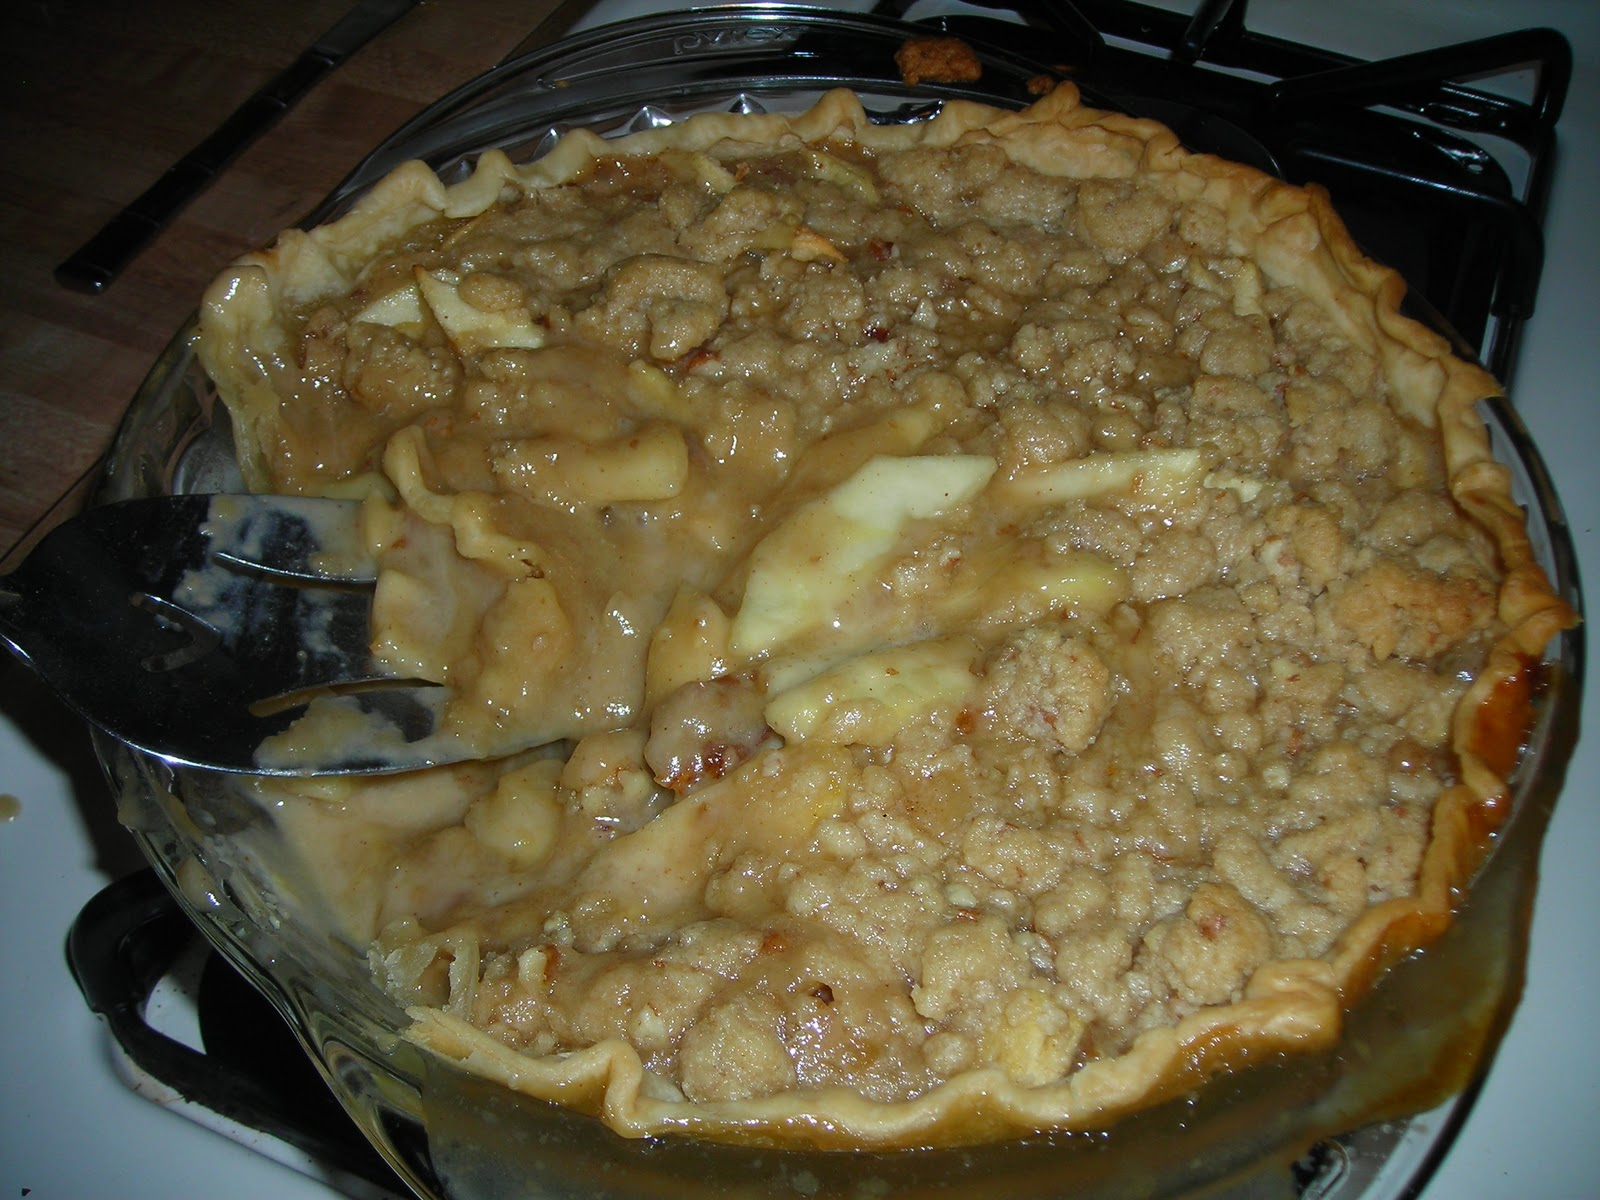 Jodie's Weekend Warm-Ups: Dreamy Apple Pie